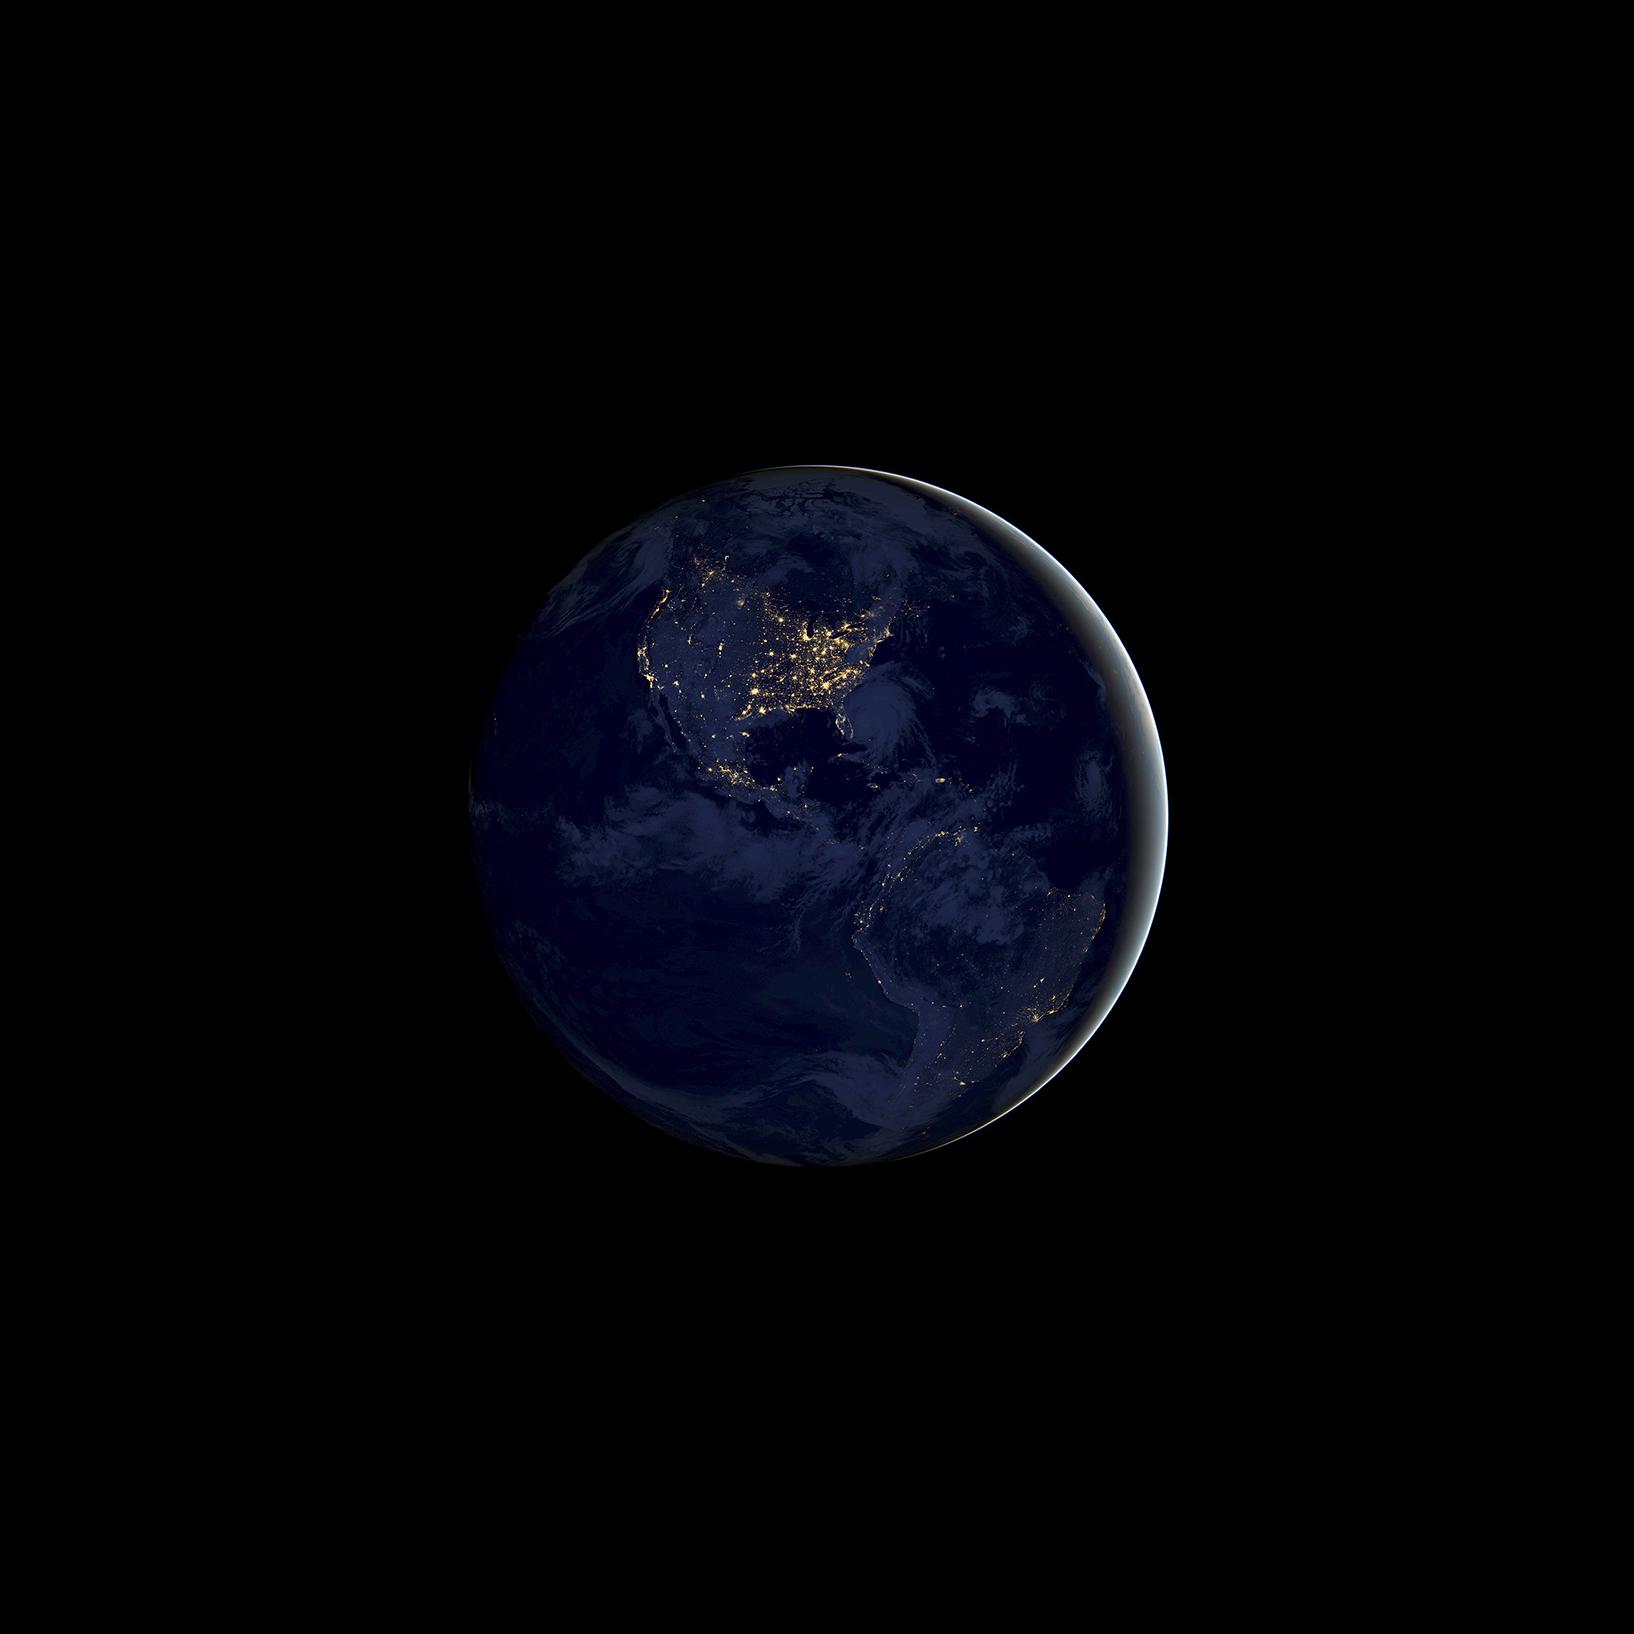 Ios 11 Gm Wallpaper Earth Night